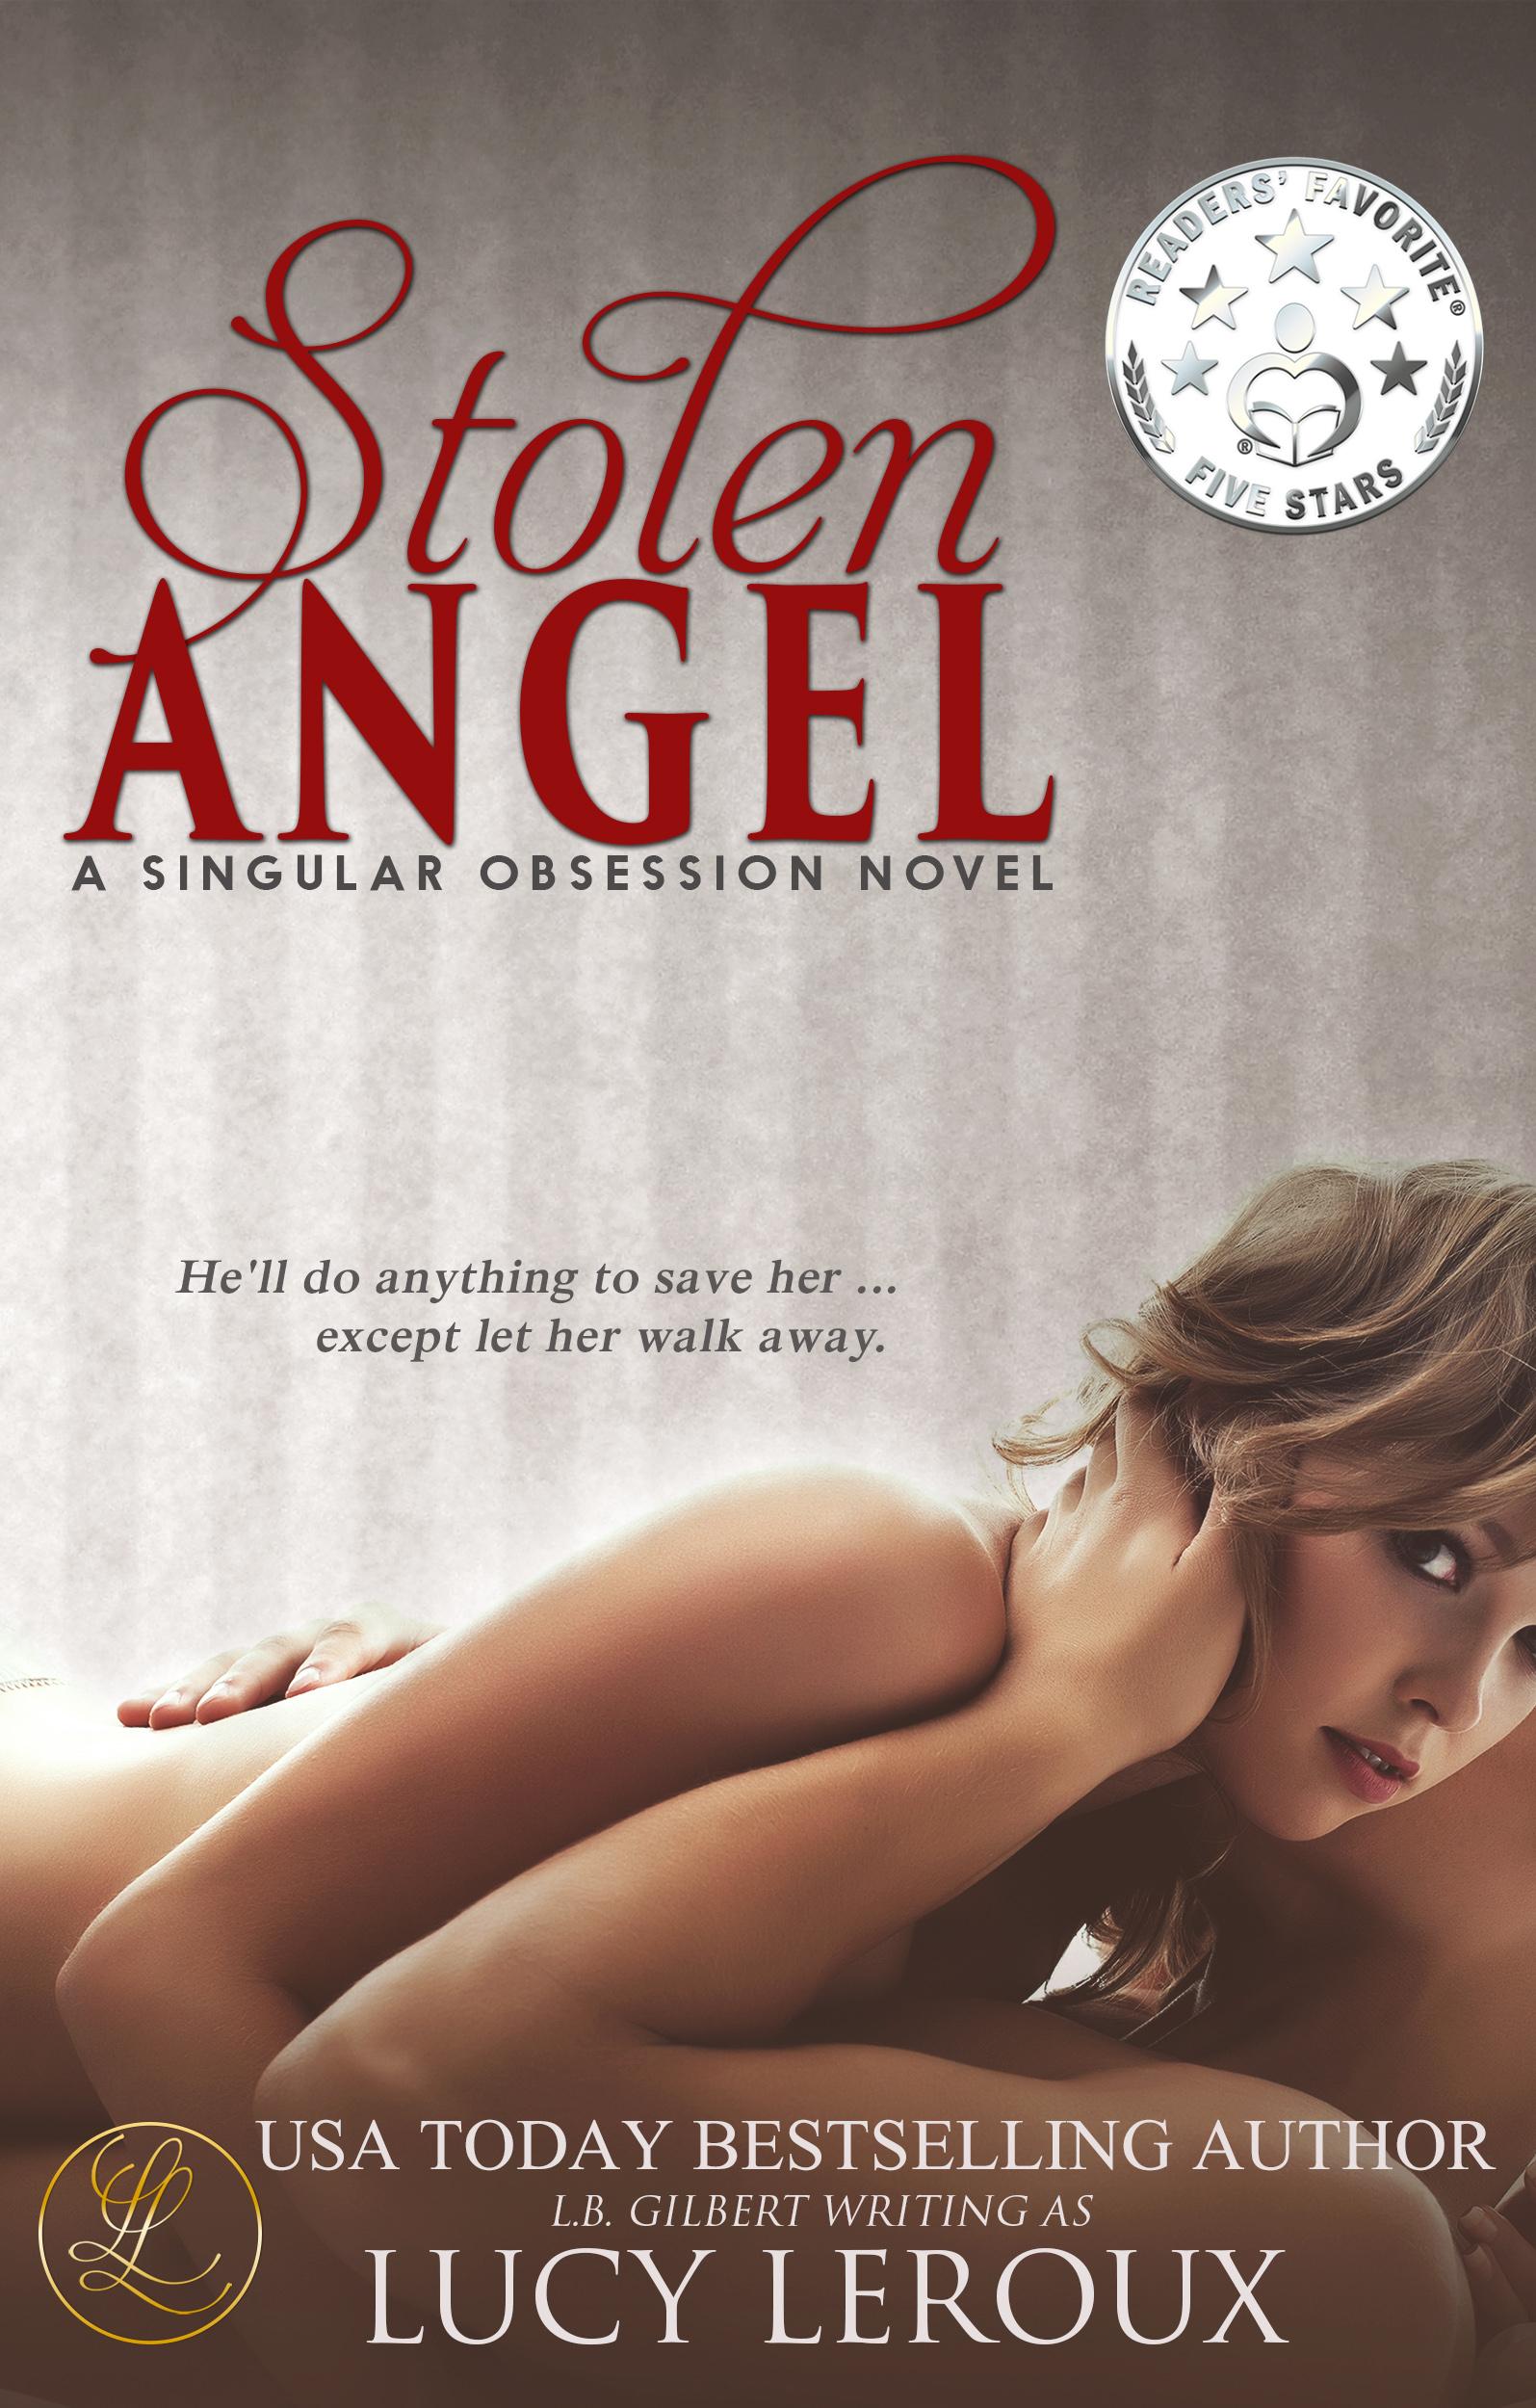 Stolen Angel, A Singular Obsession Book 3, excerpt